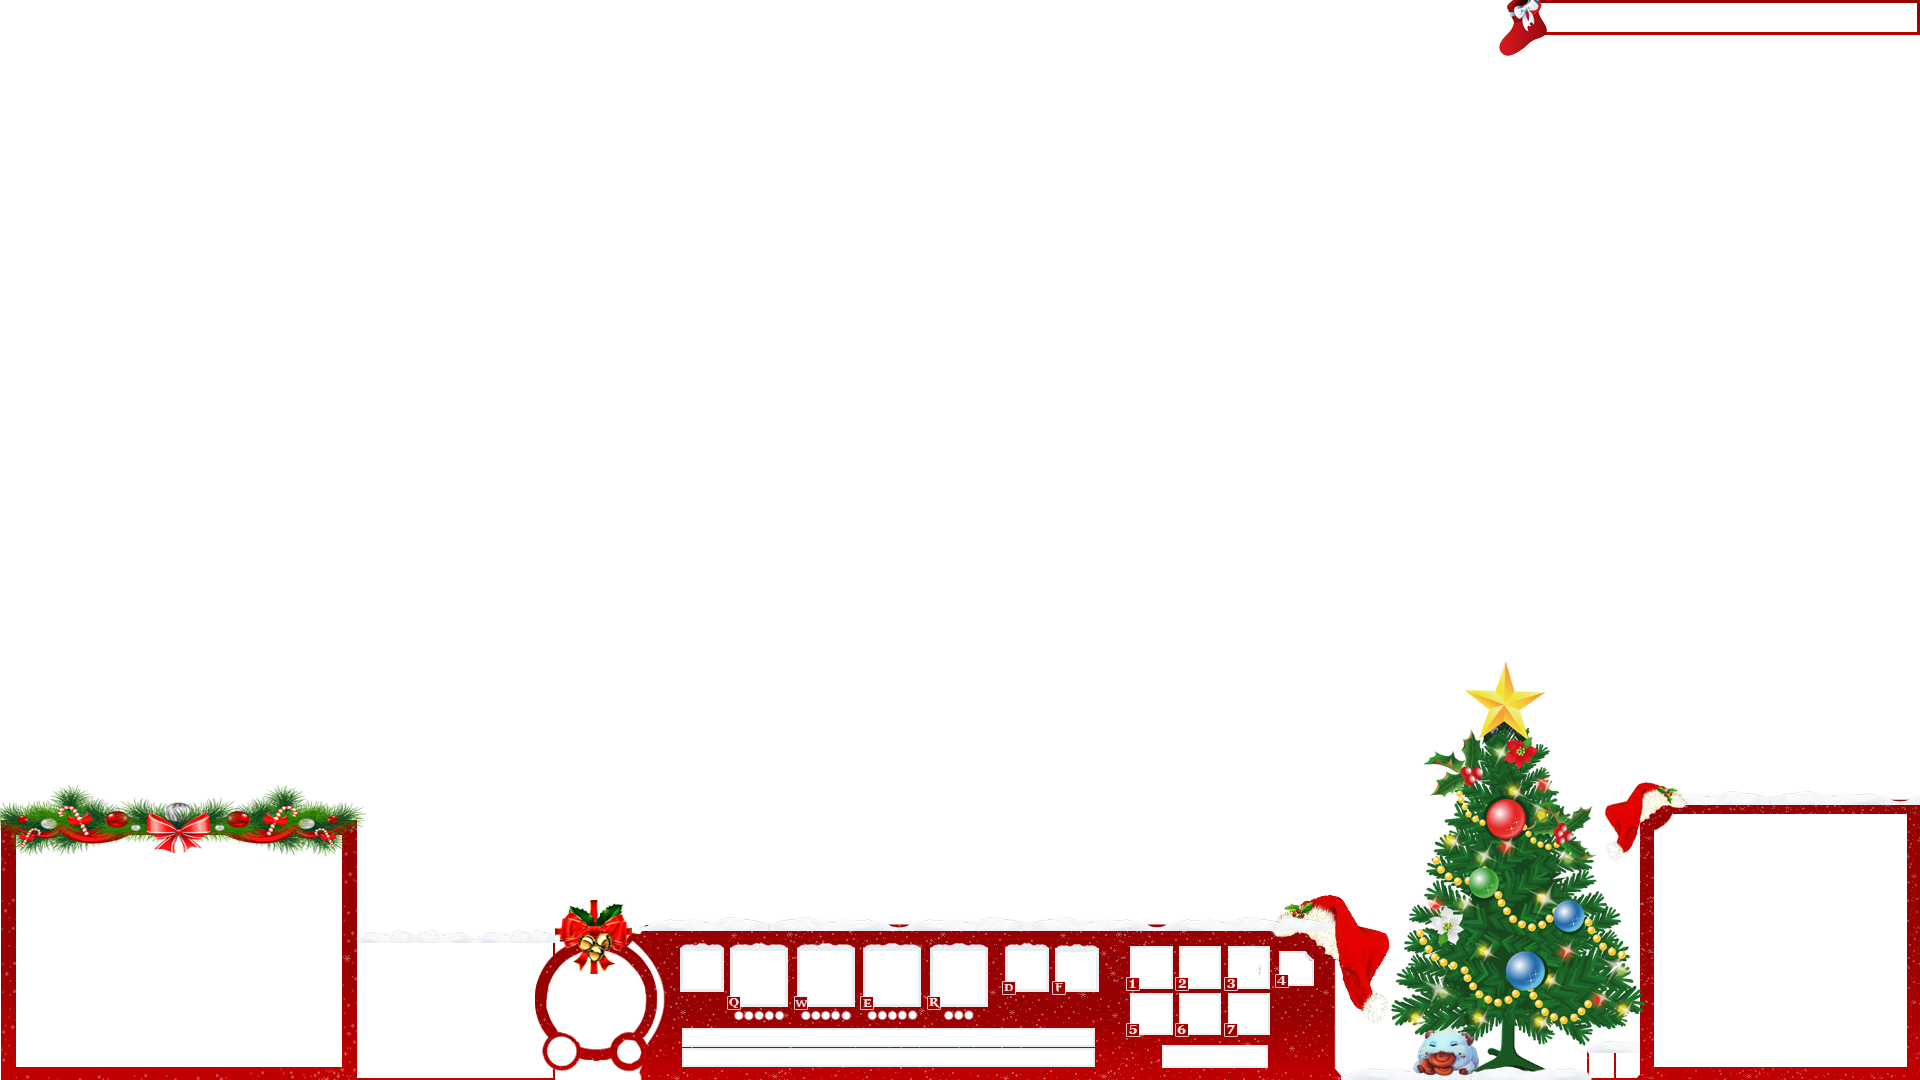 FREE]Christmas - LoL streaming overlay by lol0verlay on DeviantArt